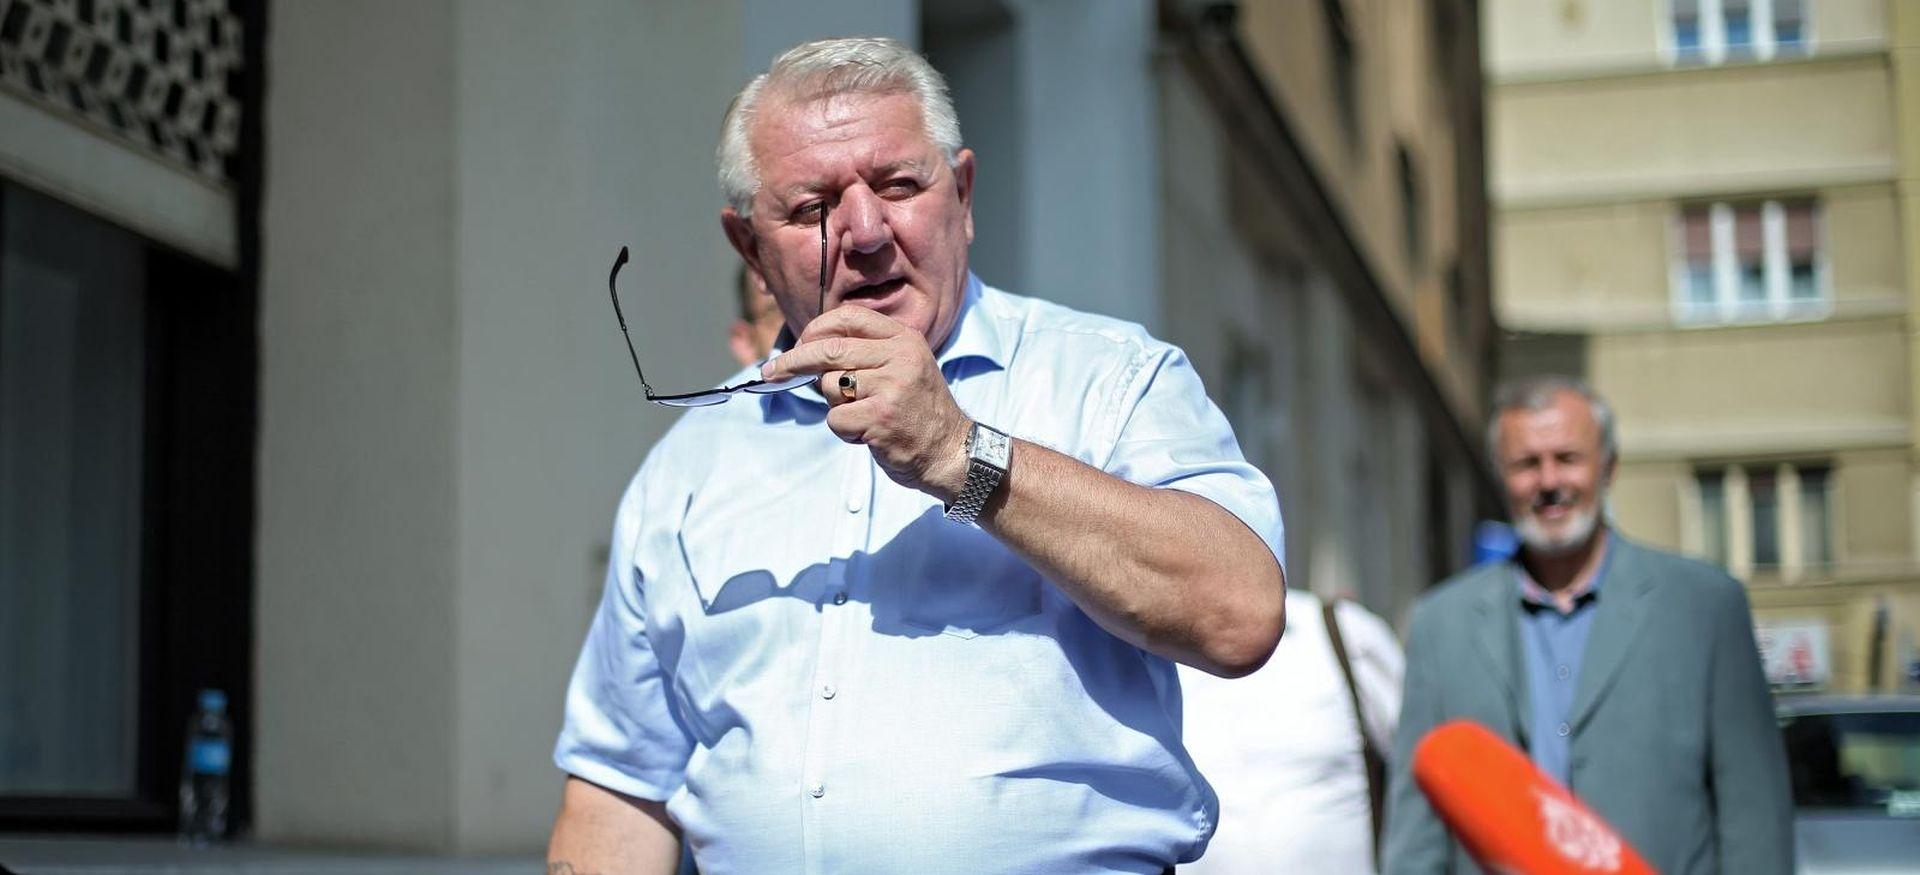 Đakić osudio sinov govor mržnje, Ivan Đakić iščlanio se iz HDZ-a